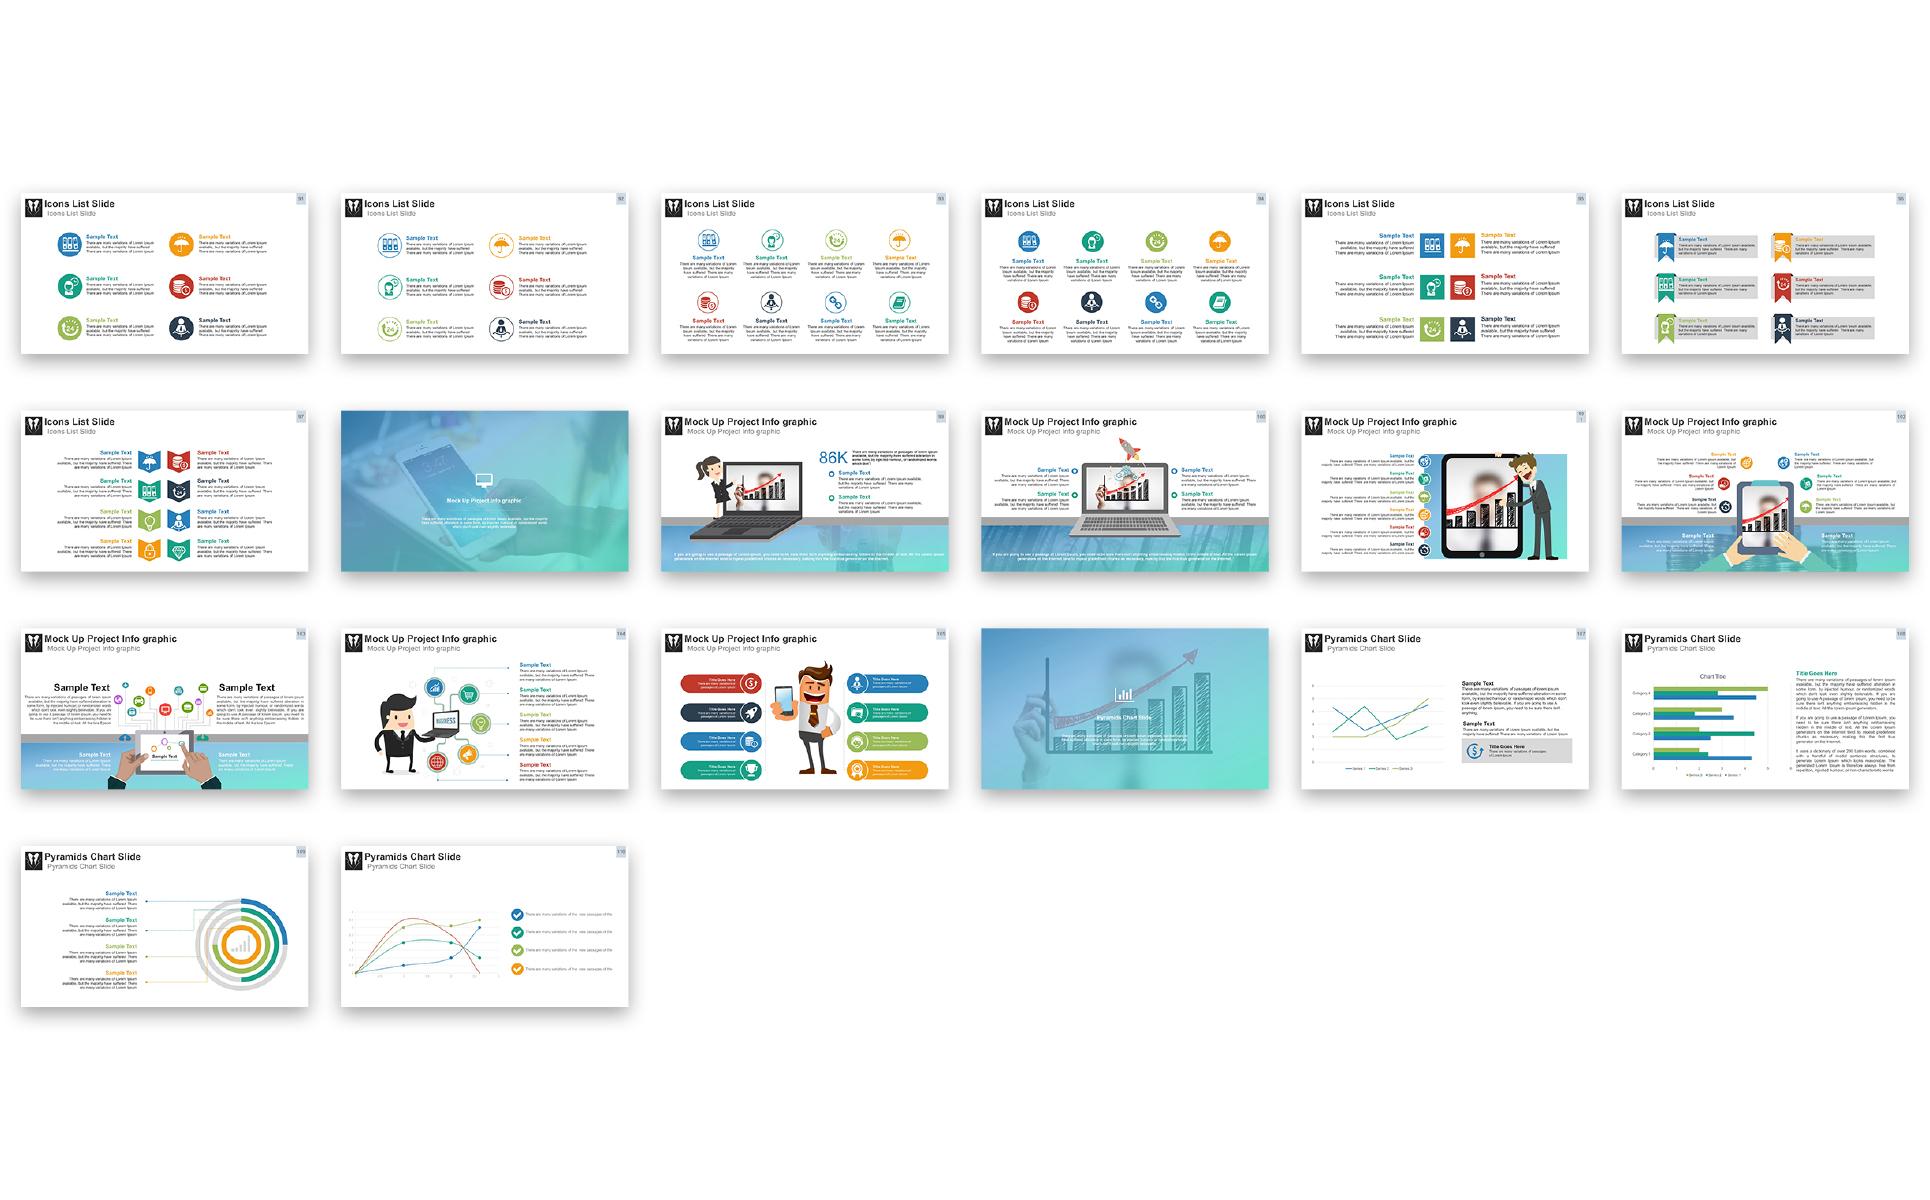 Business presentation powerpoint template 67451 zoom in toneelgroepblik Images